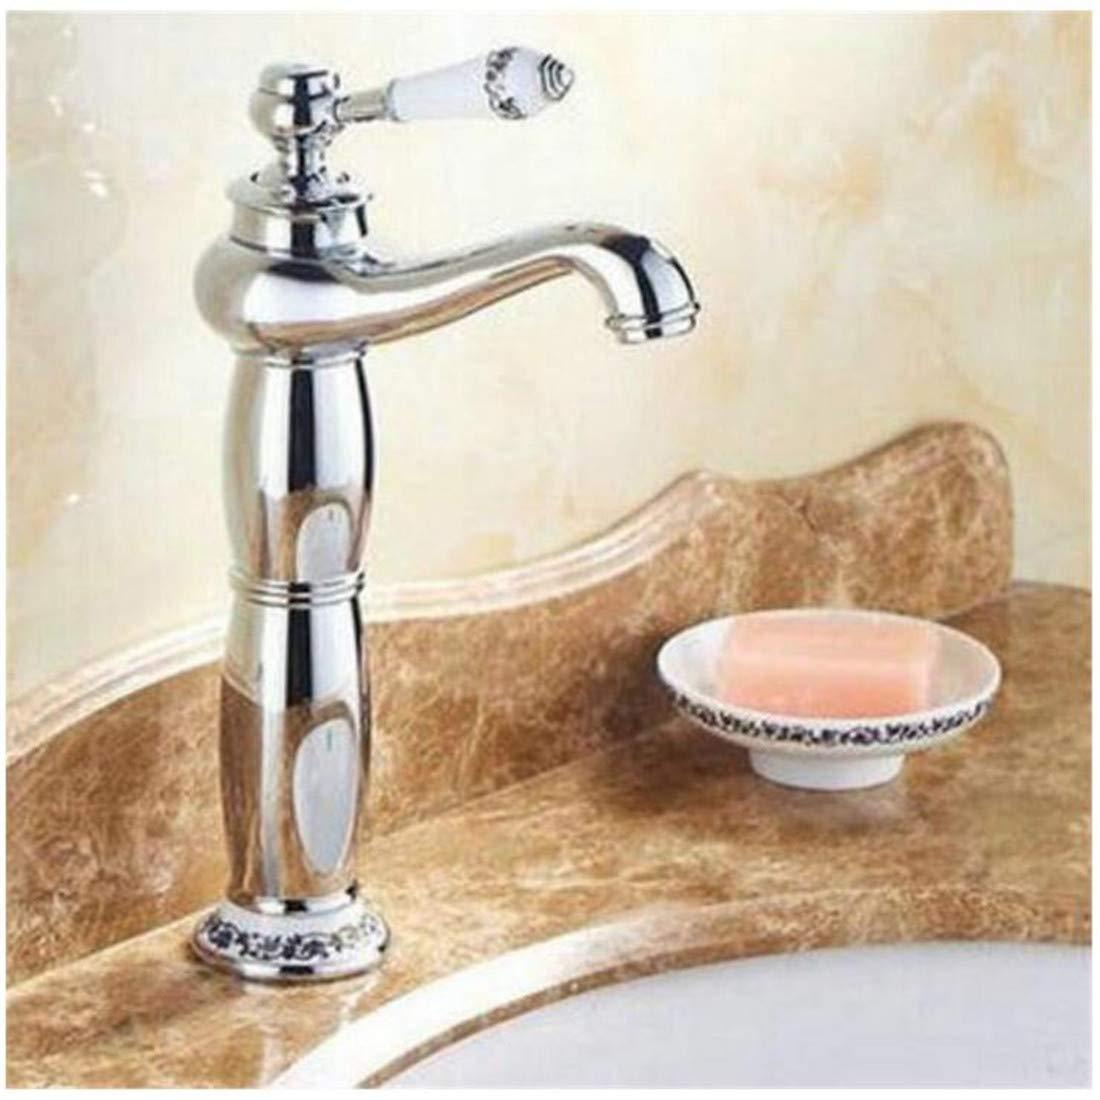 Kitchen Bath Basin Sink Bathroom Taps Bathroom Basin Faucets Mixer Brass Faucet Ctzl2549